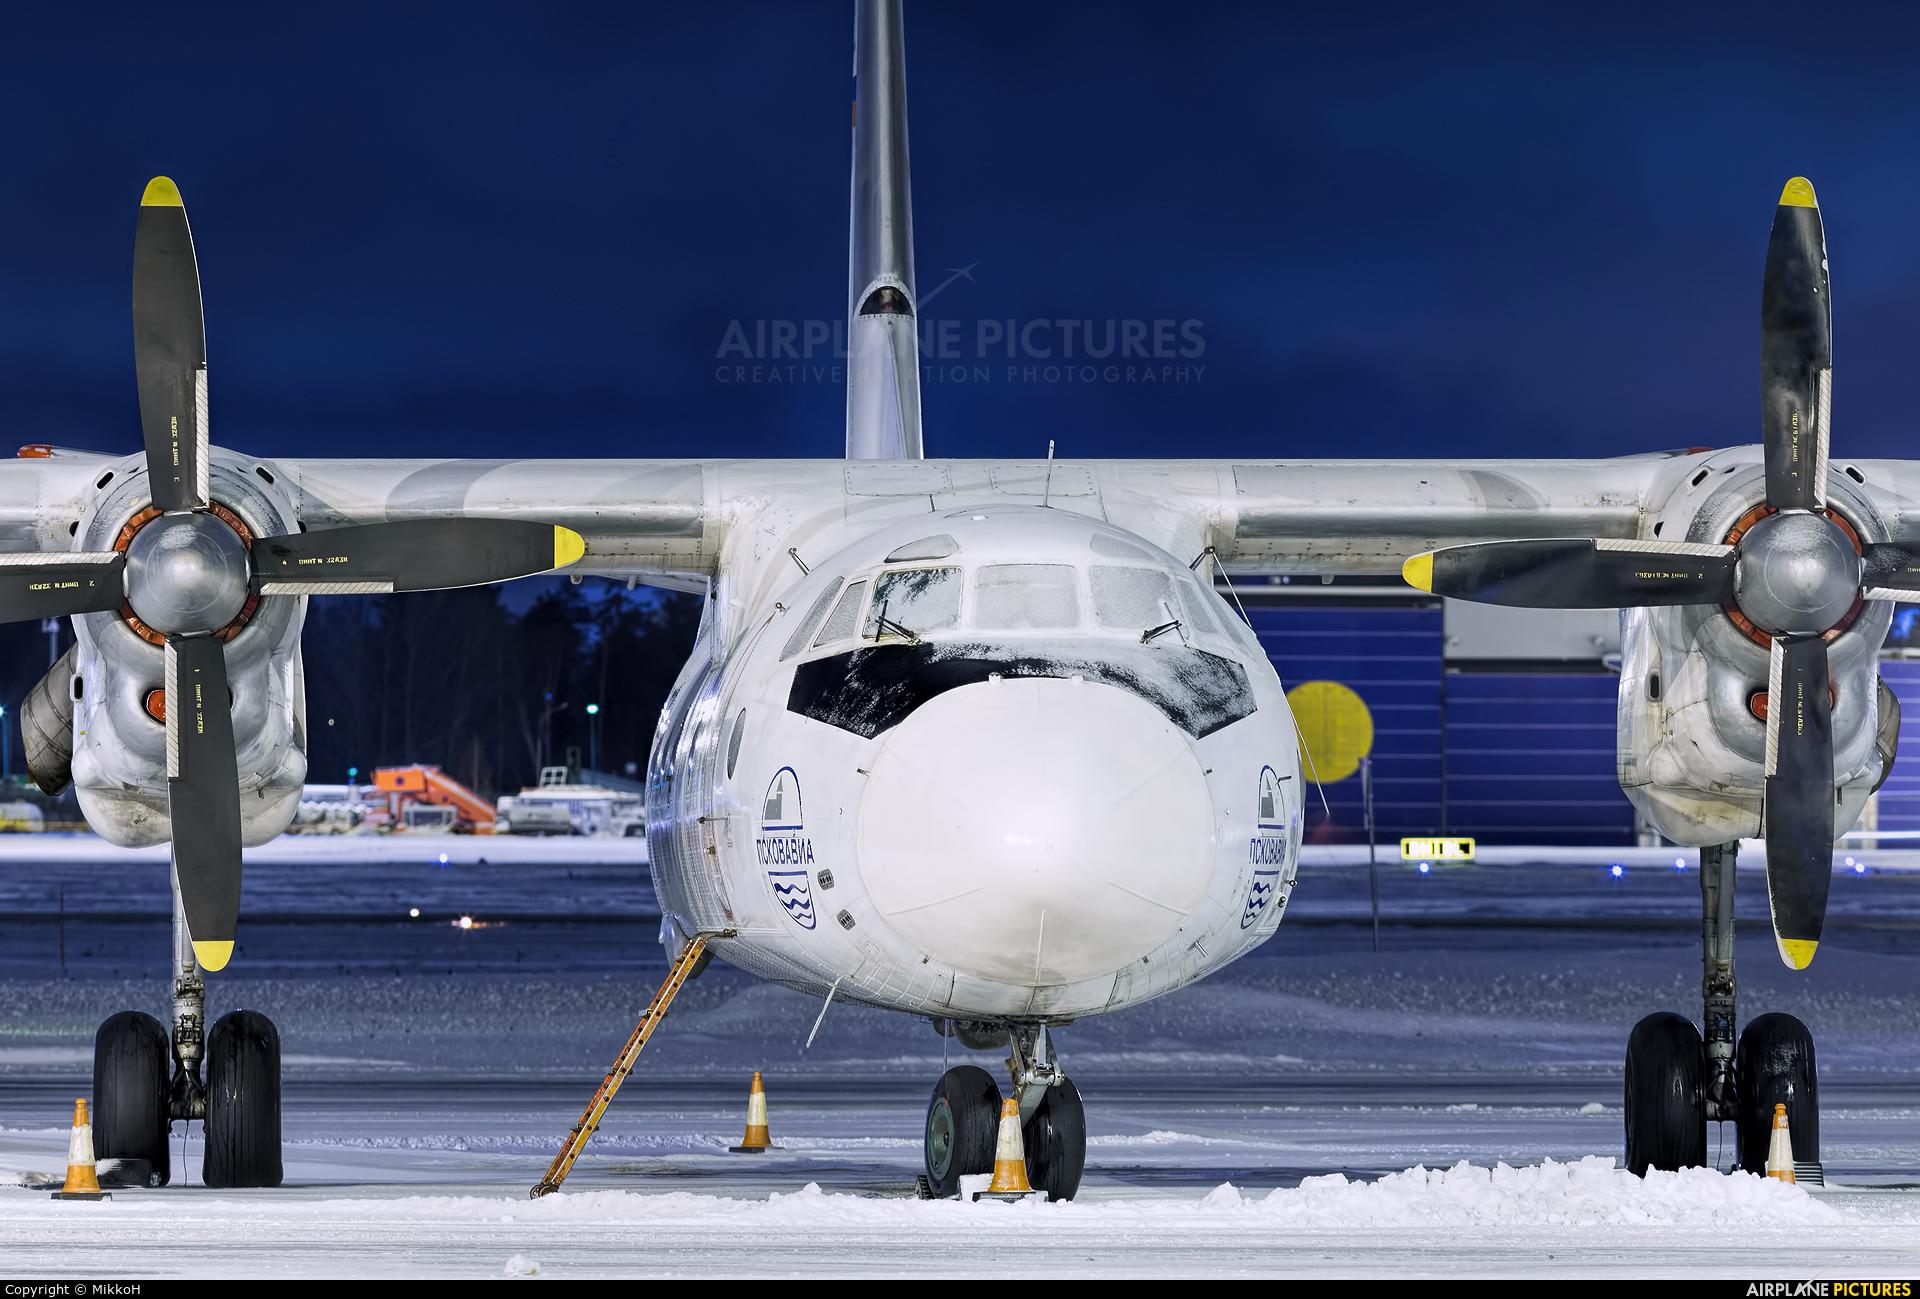 Pskovavia RA-26086 aircraft at Helsinki - Vantaa